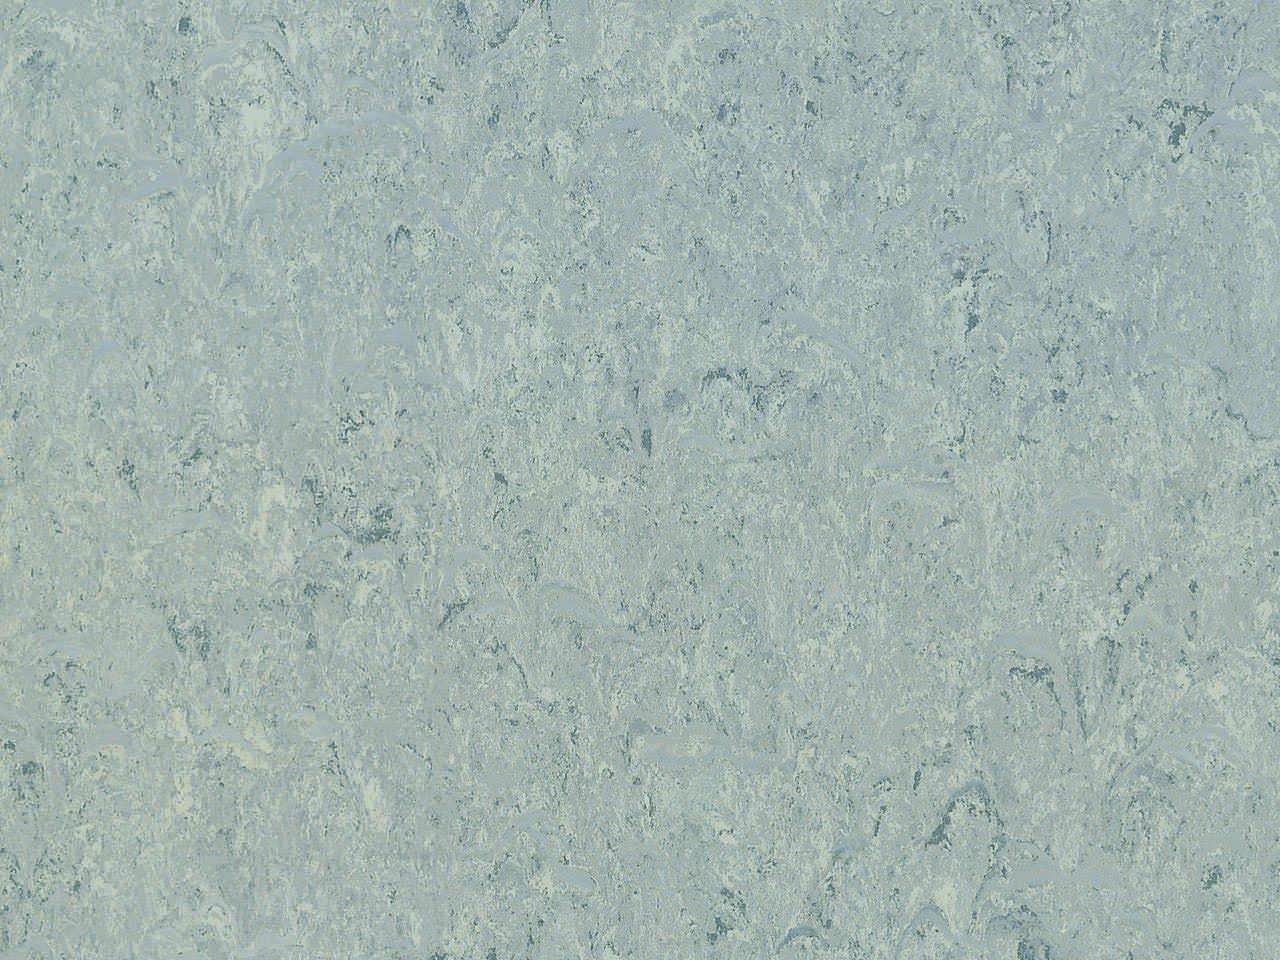 Linoleumboden muster  Wohnzimmerz: Linoleumboden Muster With Artoleum Graphic ...